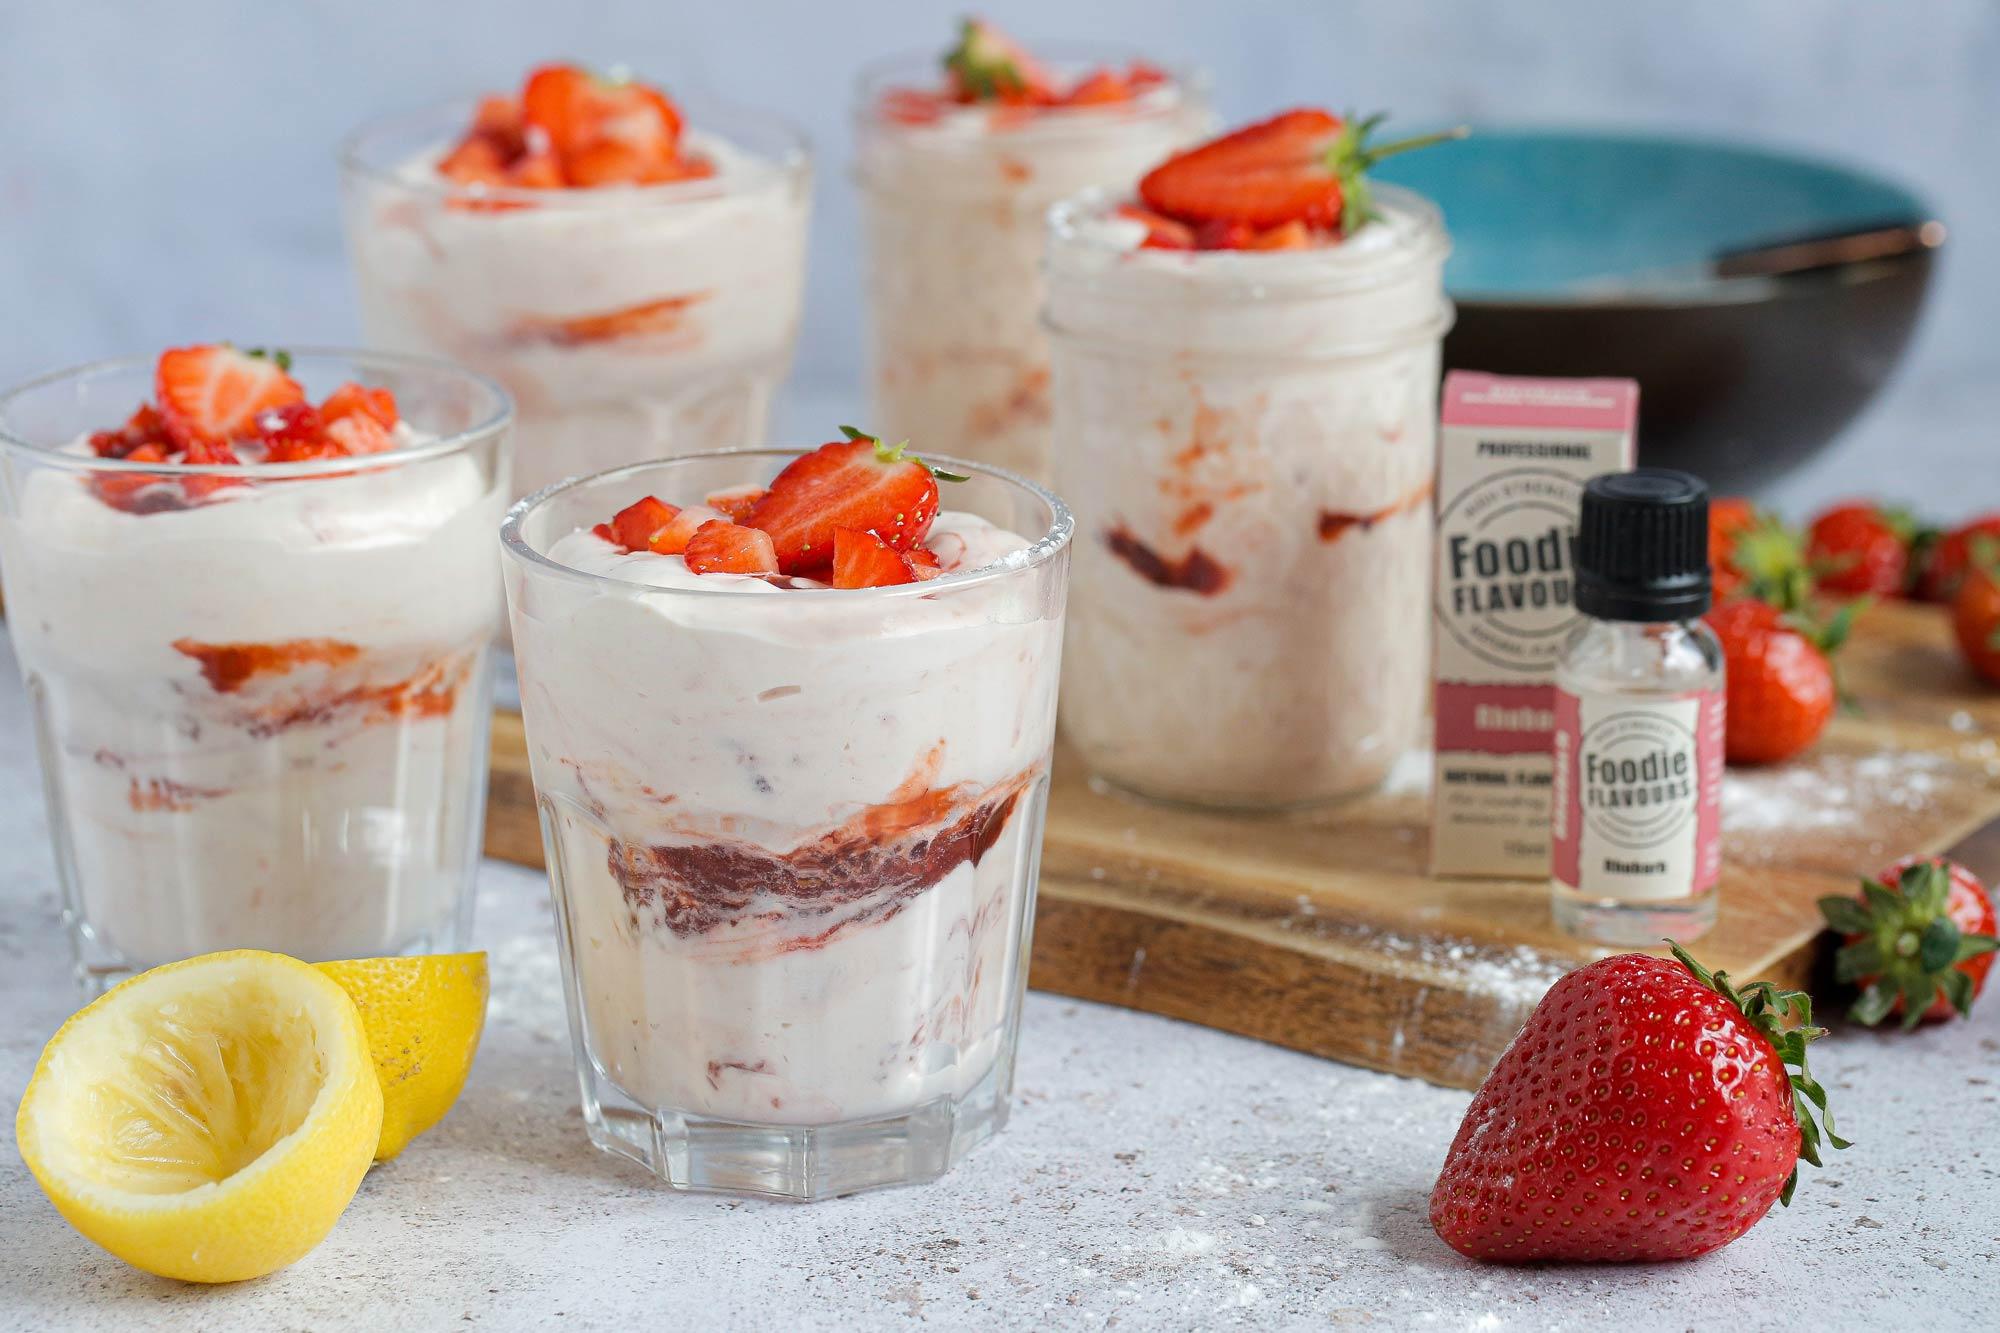 Vegan Rhubarb and Strawberry Fool Recipe